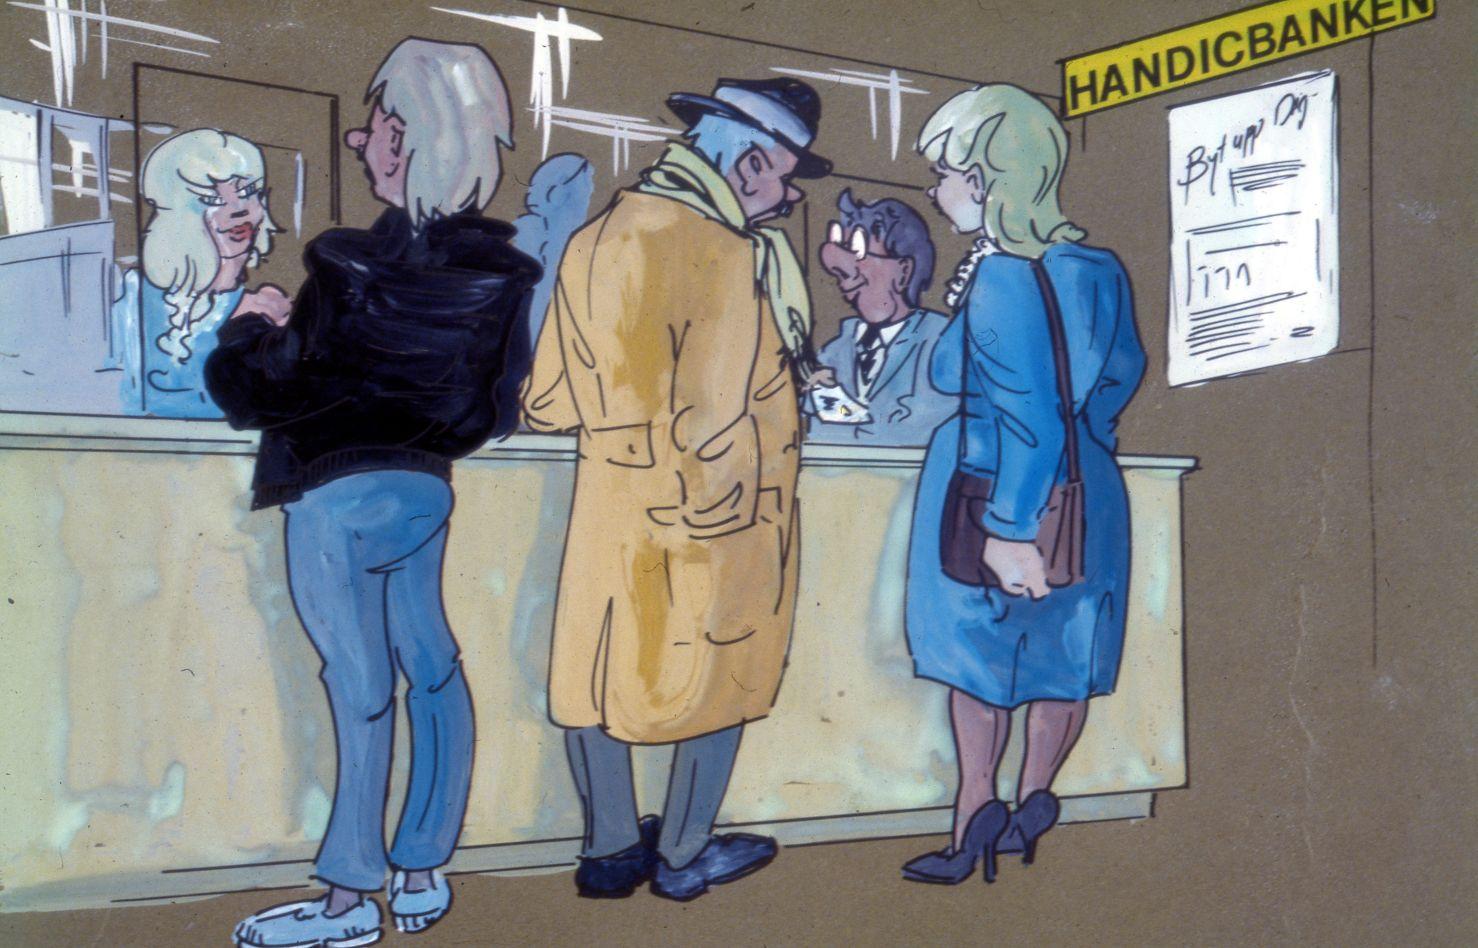 handic_byt_1983 (8)